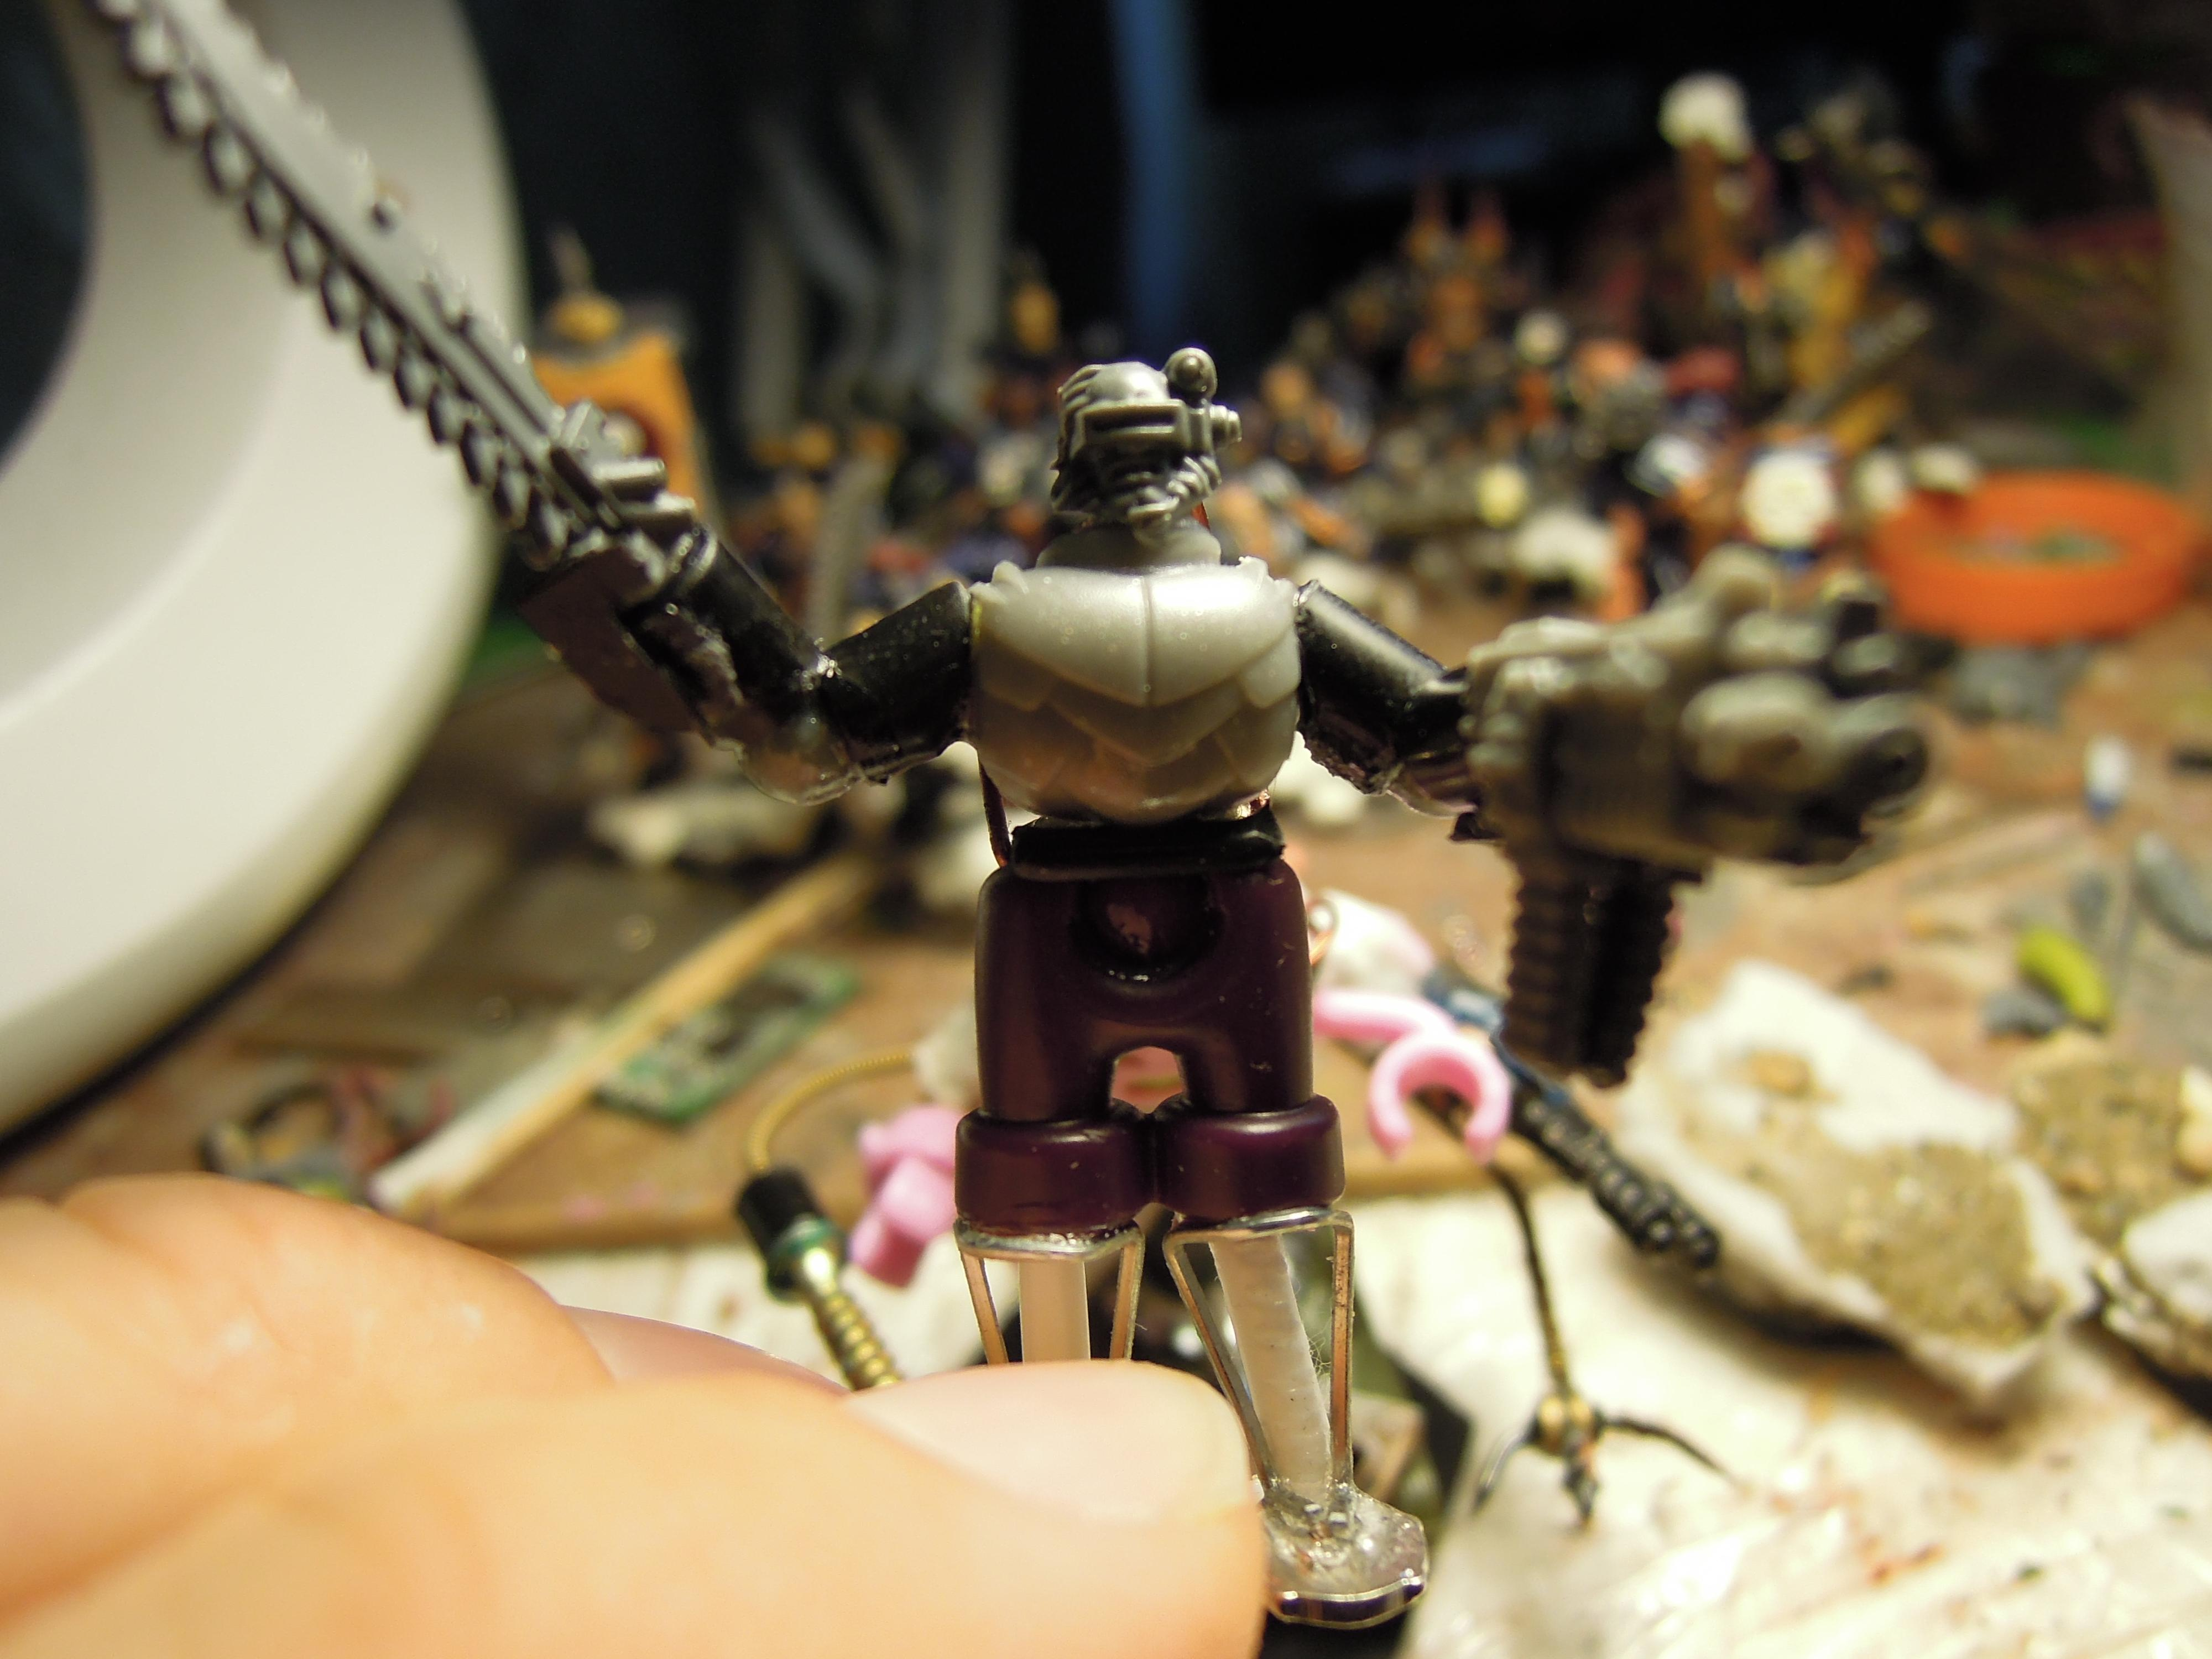 Admech, Bolter, Chainsword, Chaos, Conversion, Cyborg, Dark Mechanicus, Heresy, Kitbash, Retinue, Scratch Build, Servitors, Strogg, Warhammer 40,000